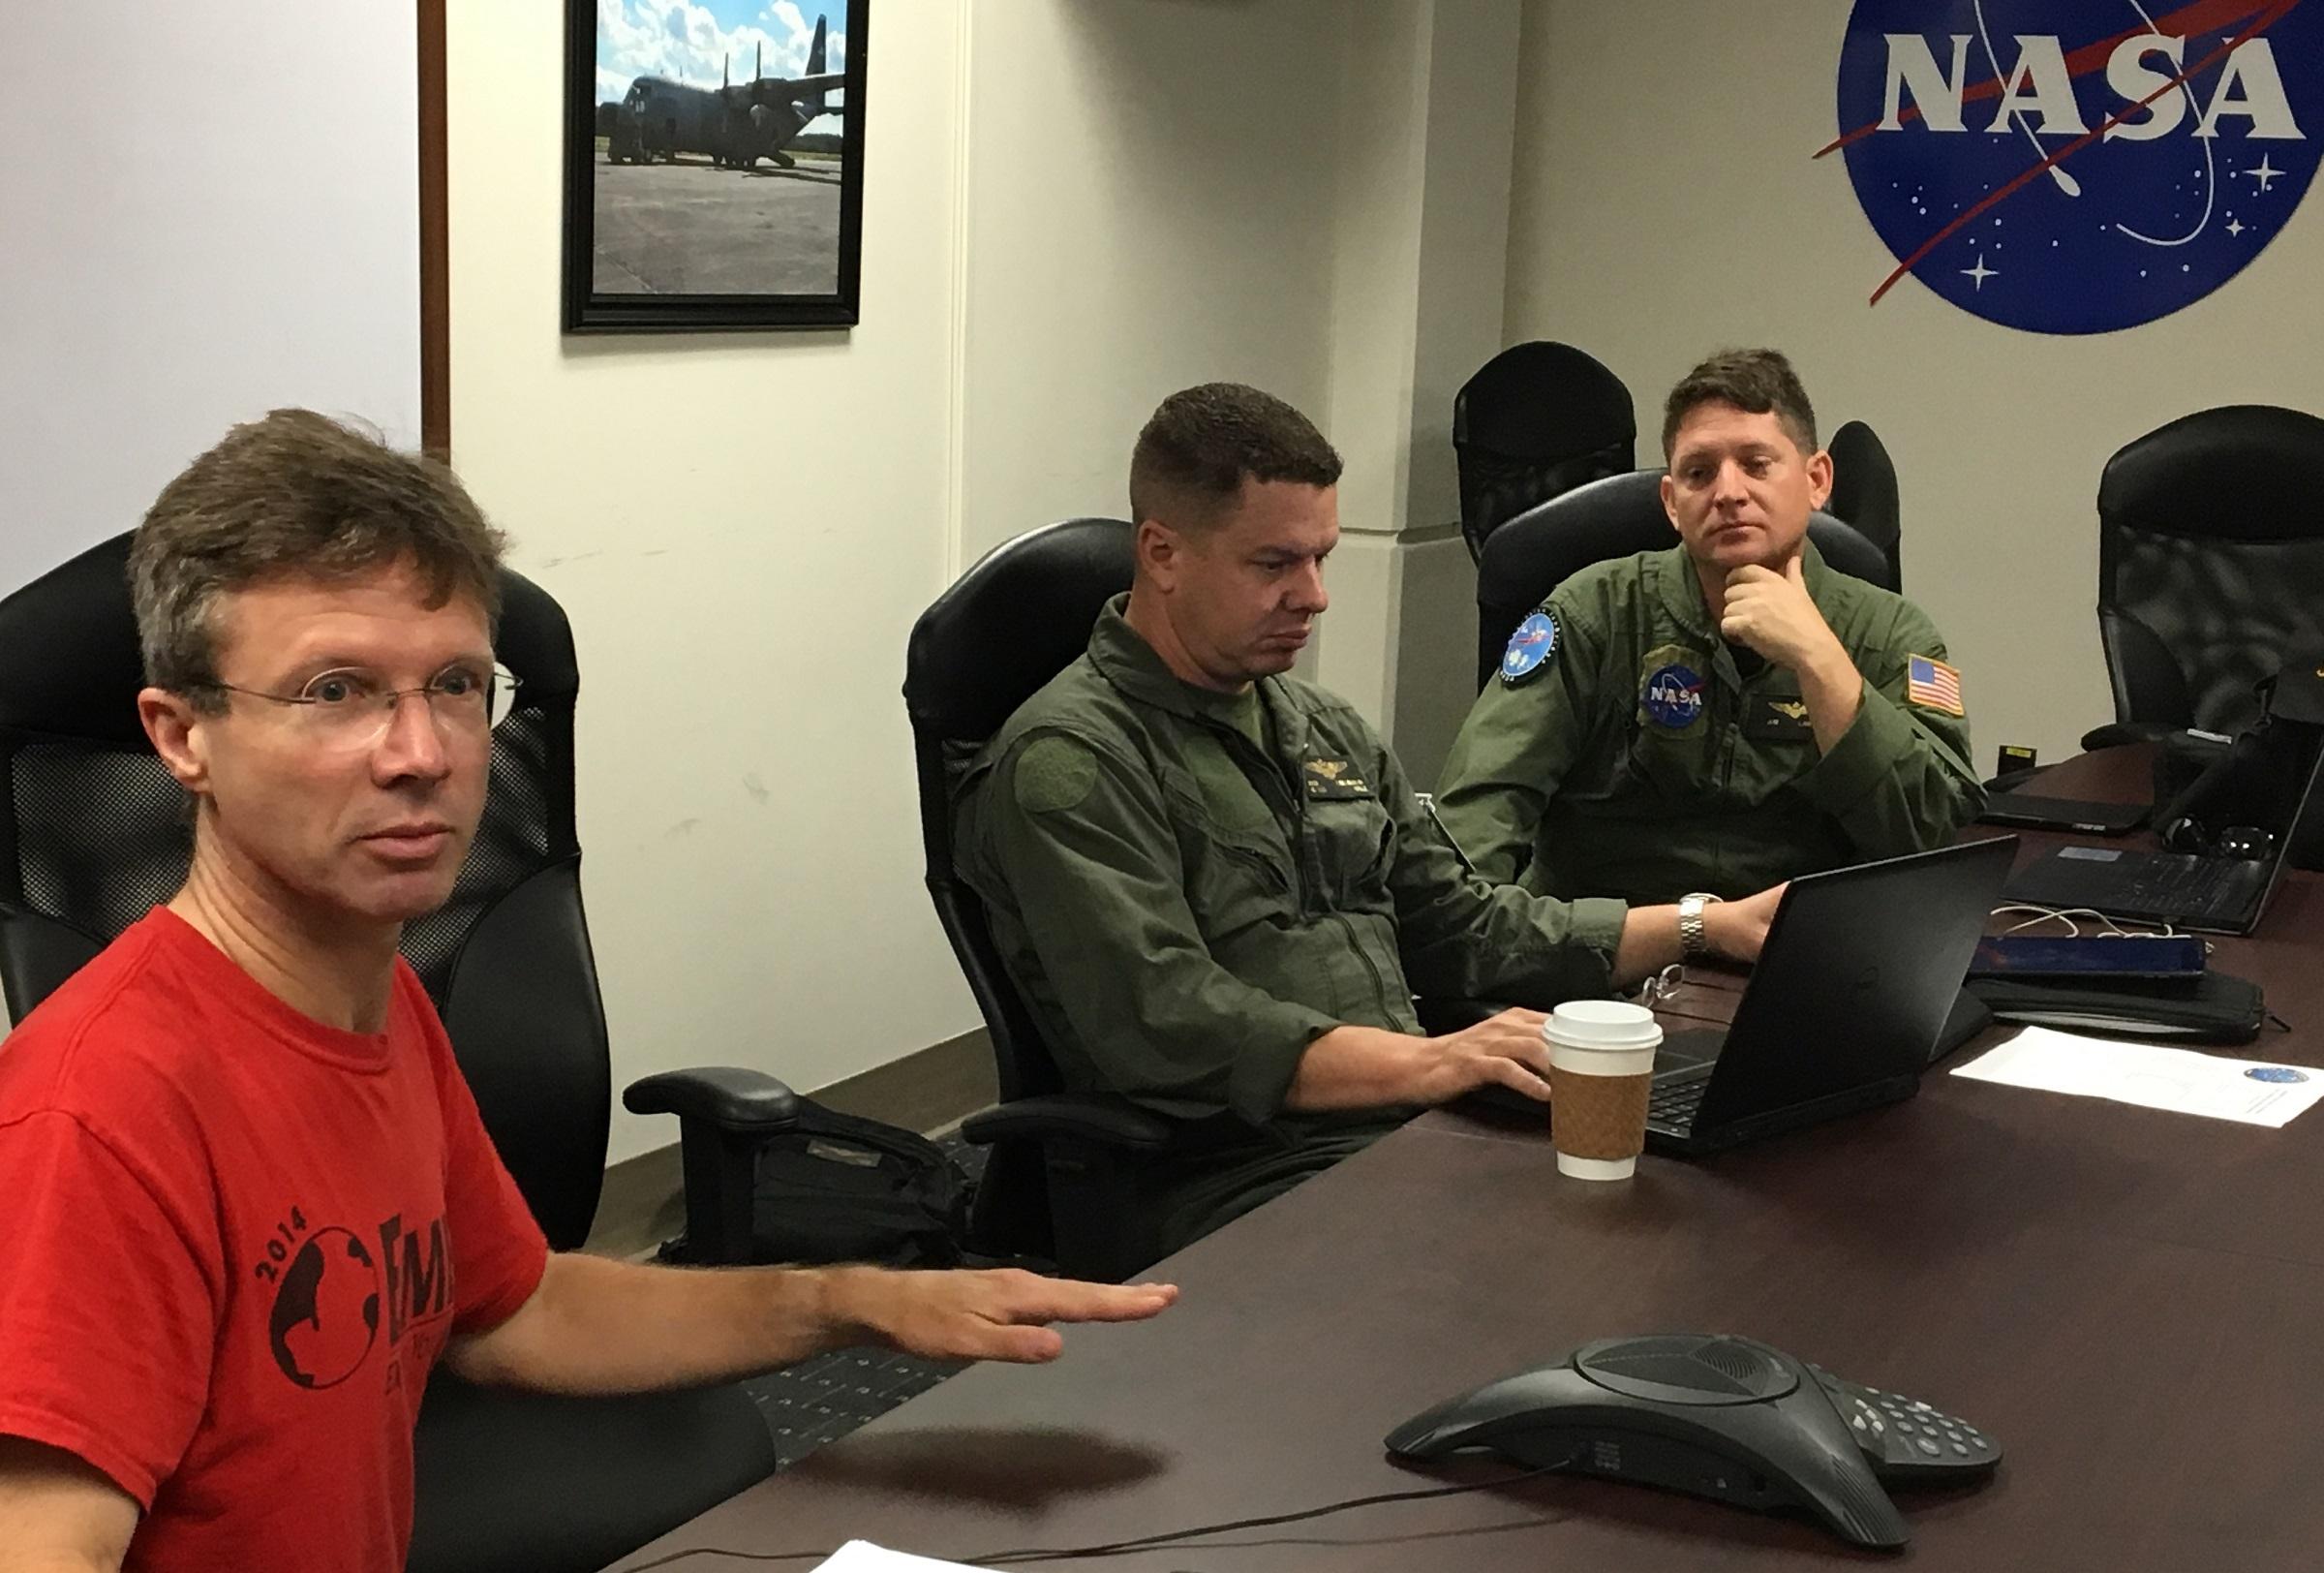 usa nasa pilots - photo #27